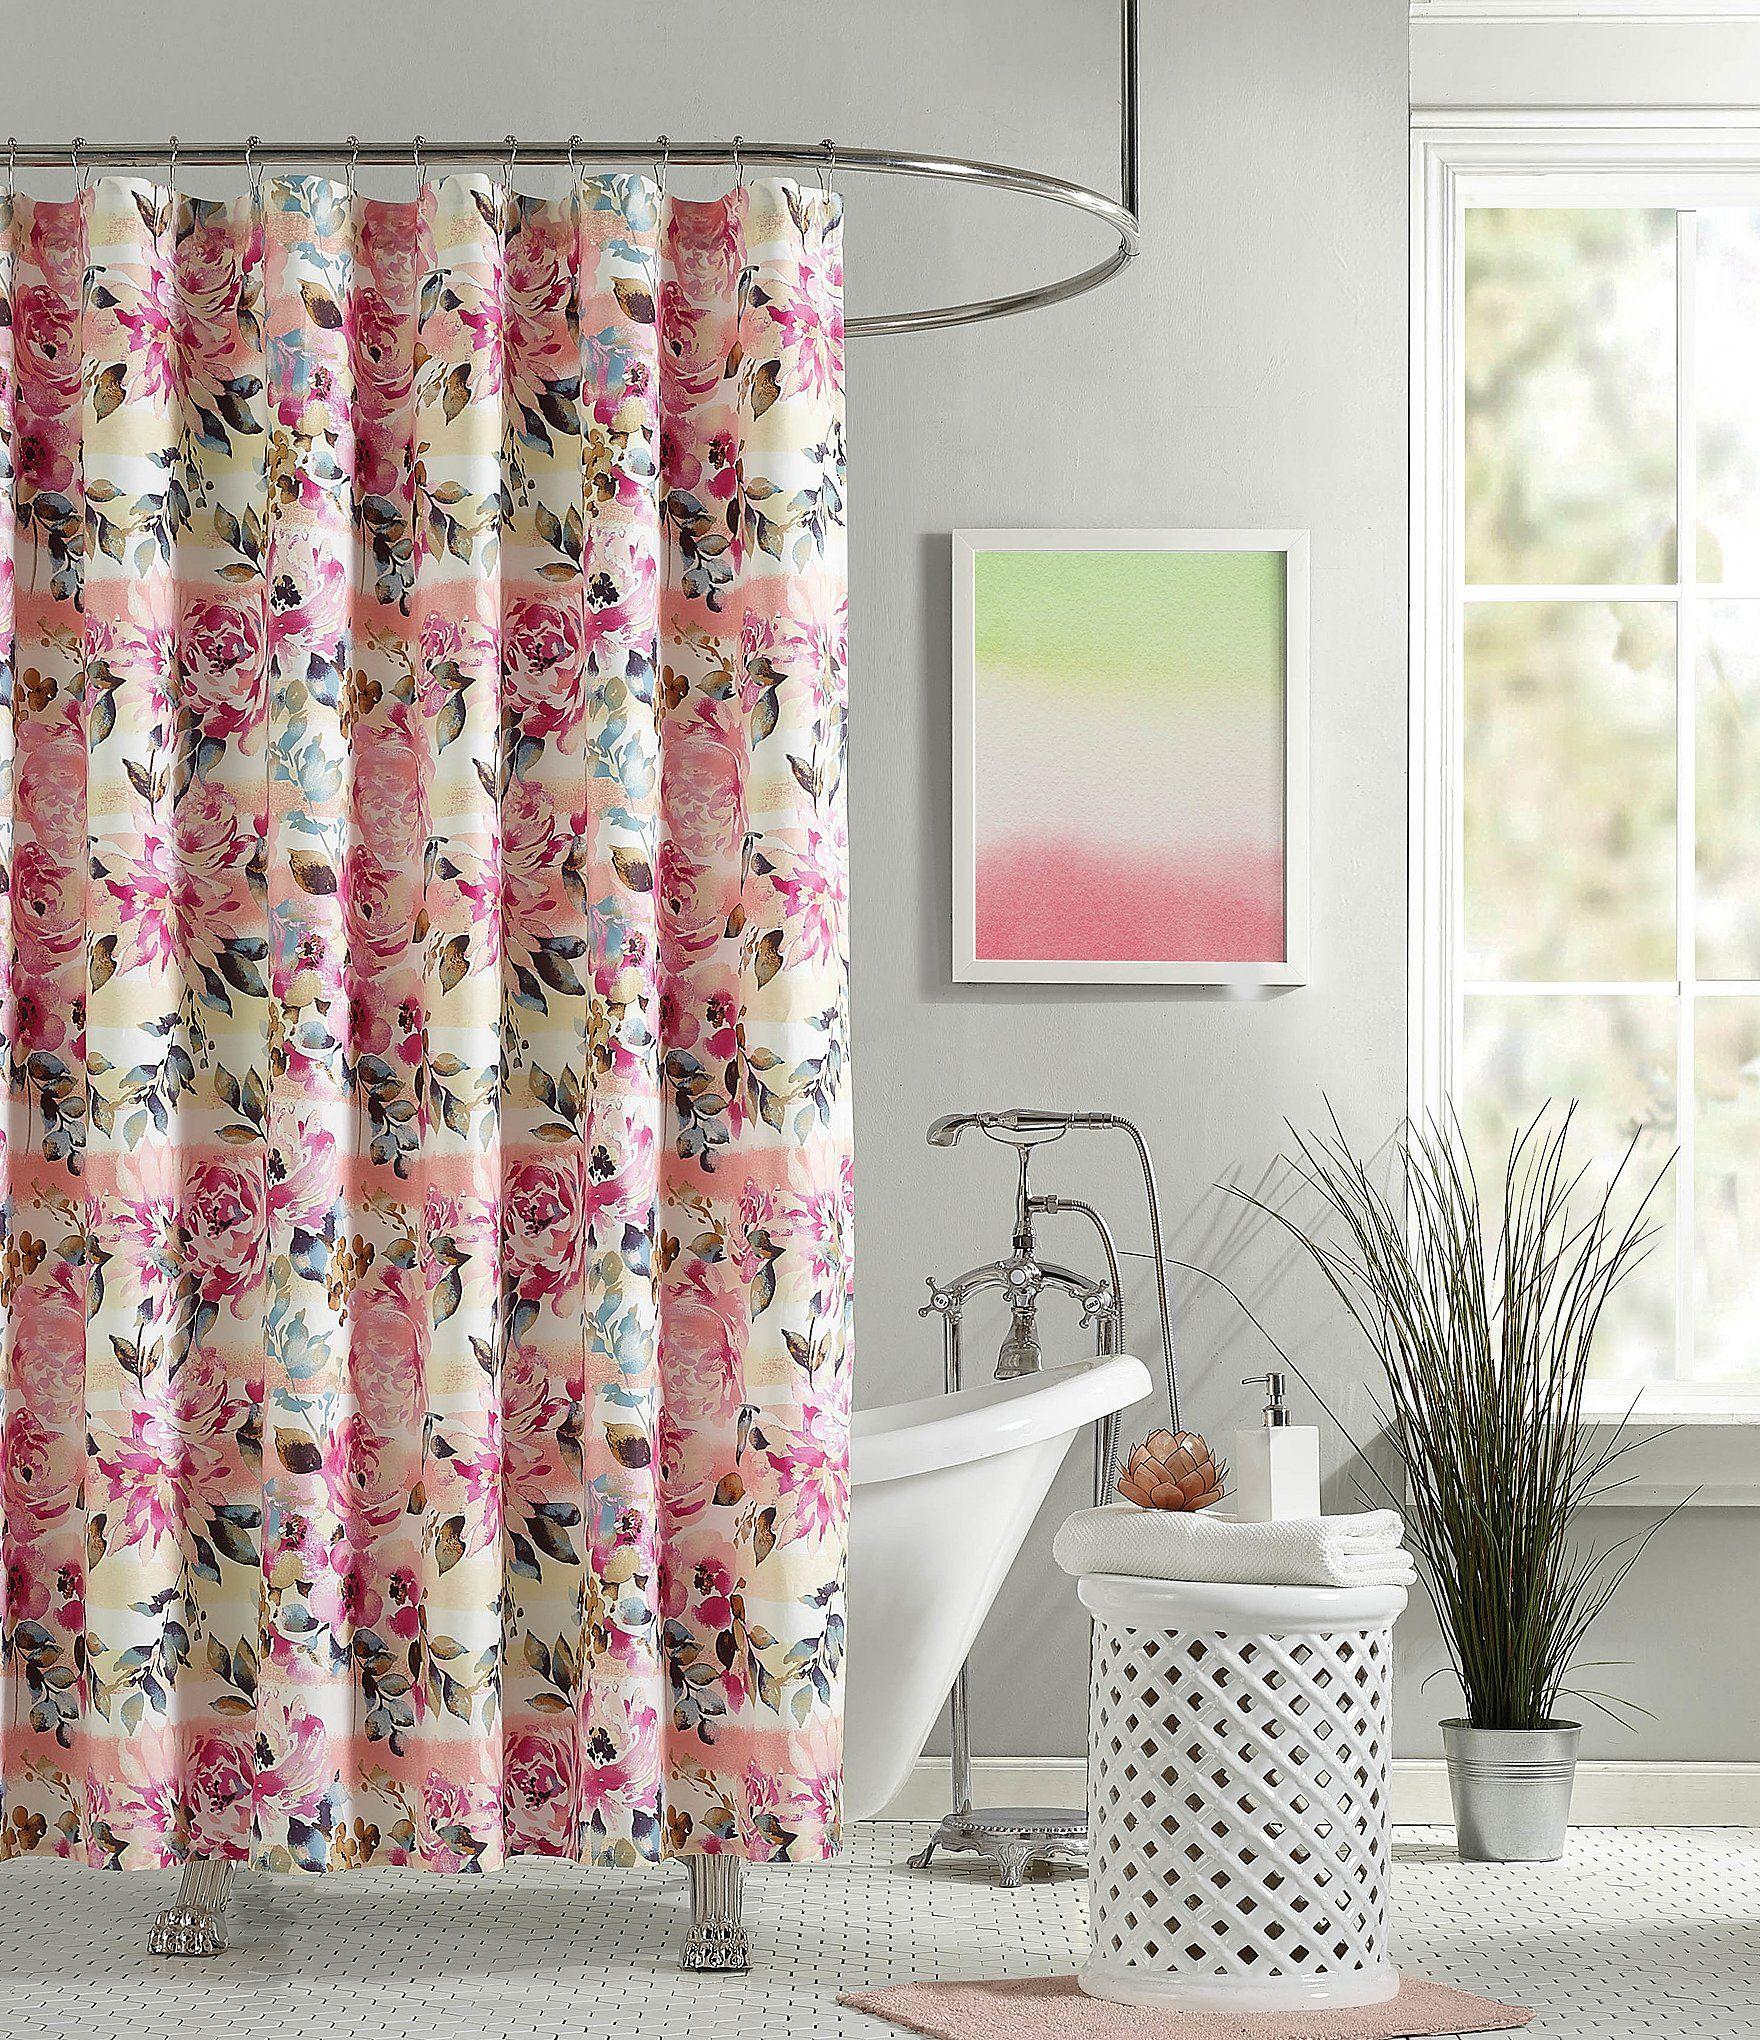 Jessica Simpson Bellisima Shower Curtain Powder Room Decor